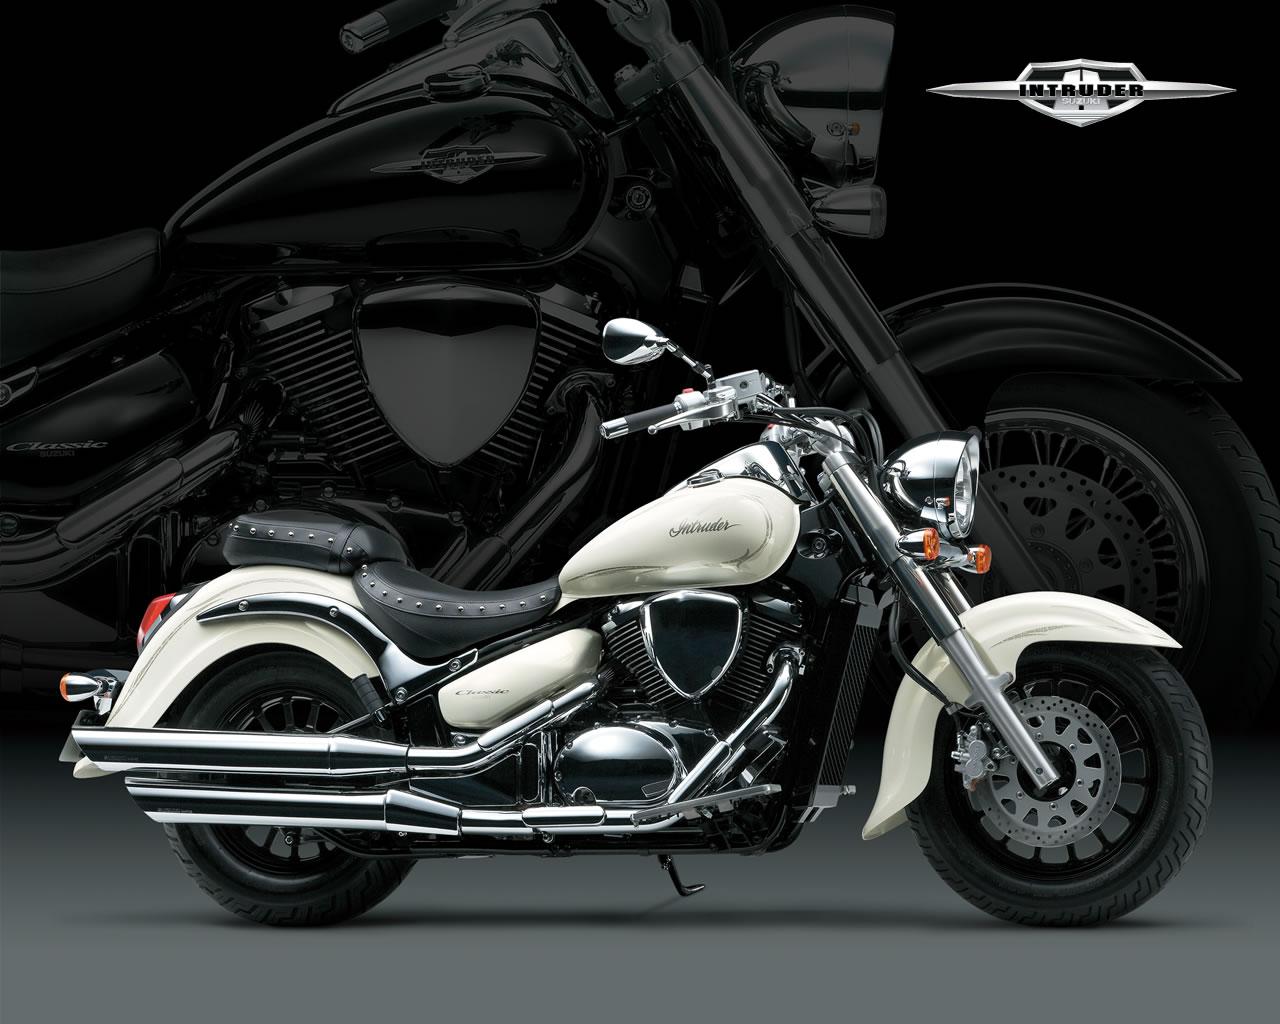 http://3.bp.blogspot.com/-TPNqA0-Eaig/TrWPgmbEqZI/AAAAAAAABBs/pigJMeVeDcc/s1600/Suzuki+Intruder+400+2011+04.jpg